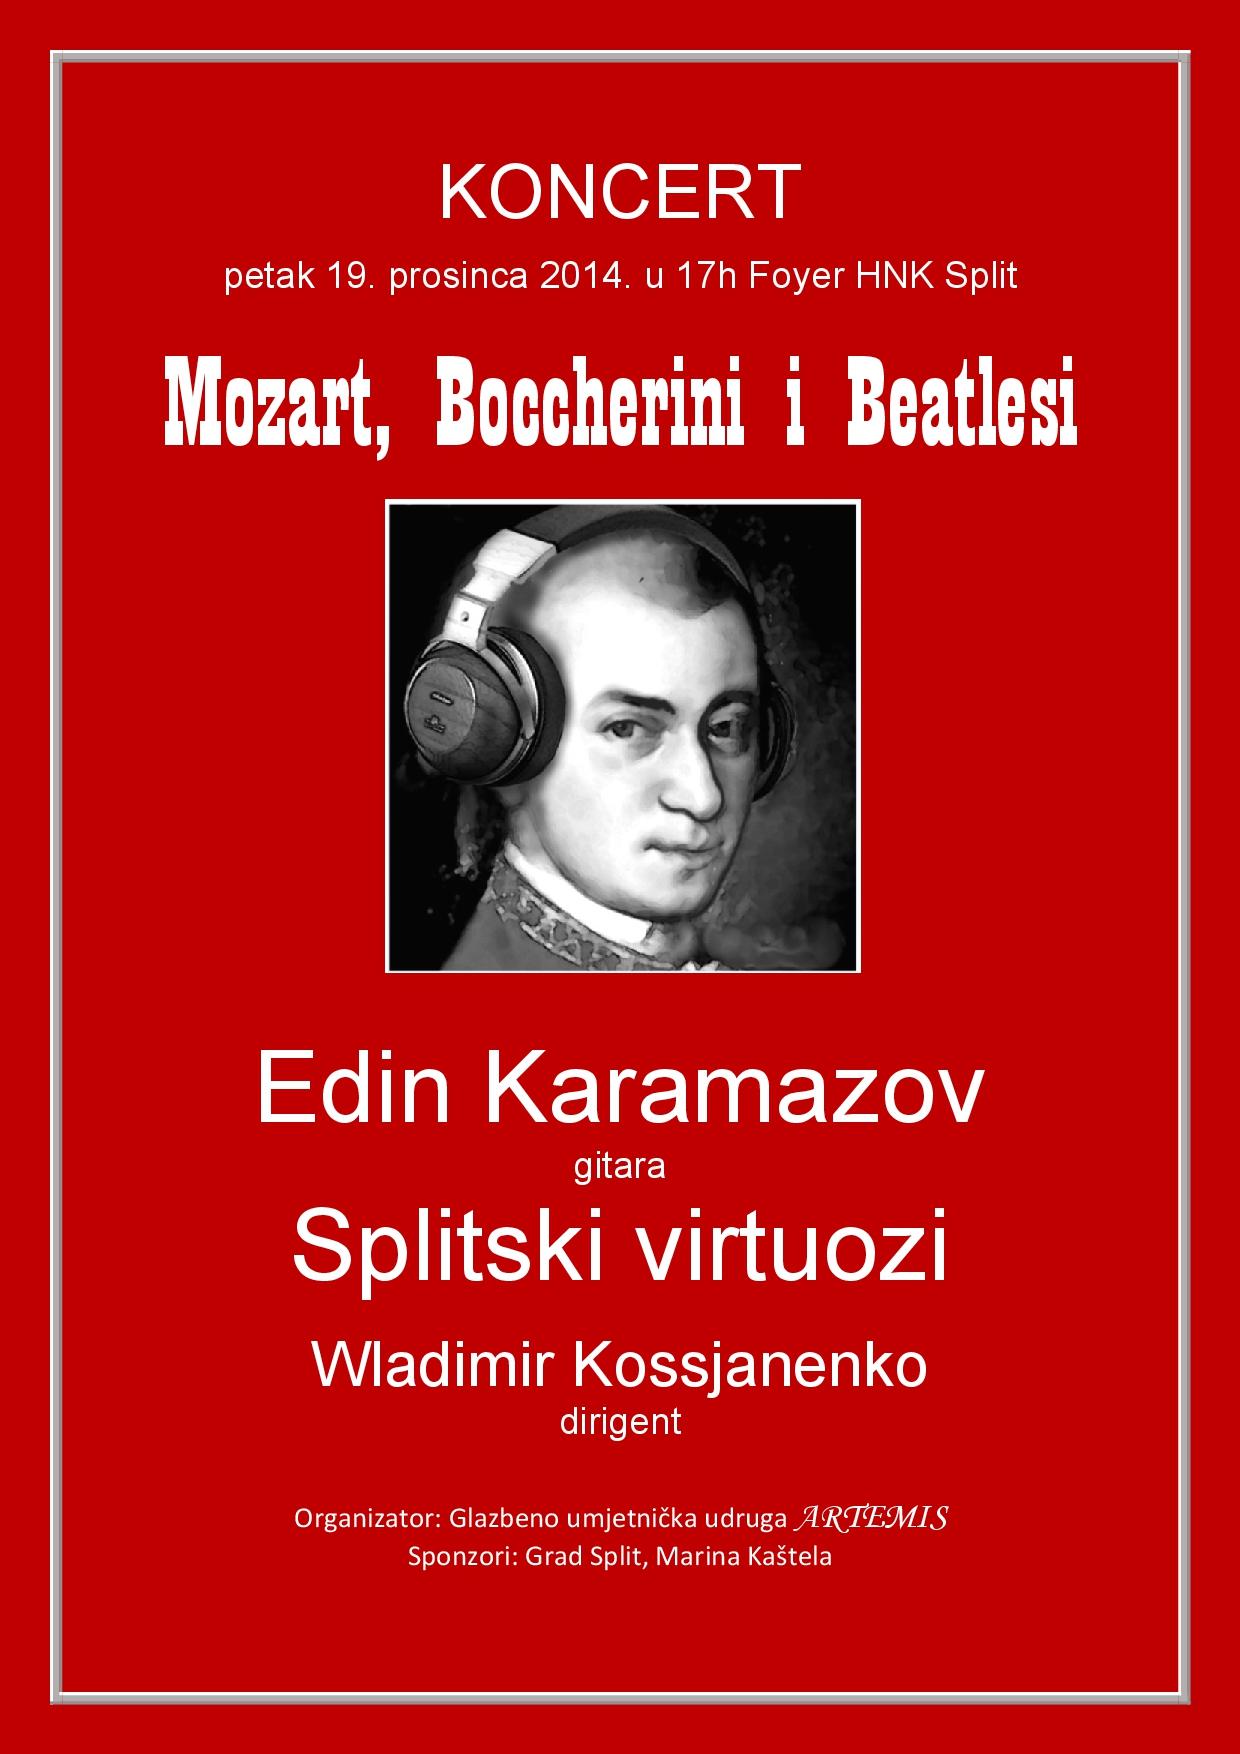 Mozart&Beatles_Karamazov_Kossjanenko_Splitski virtuozi